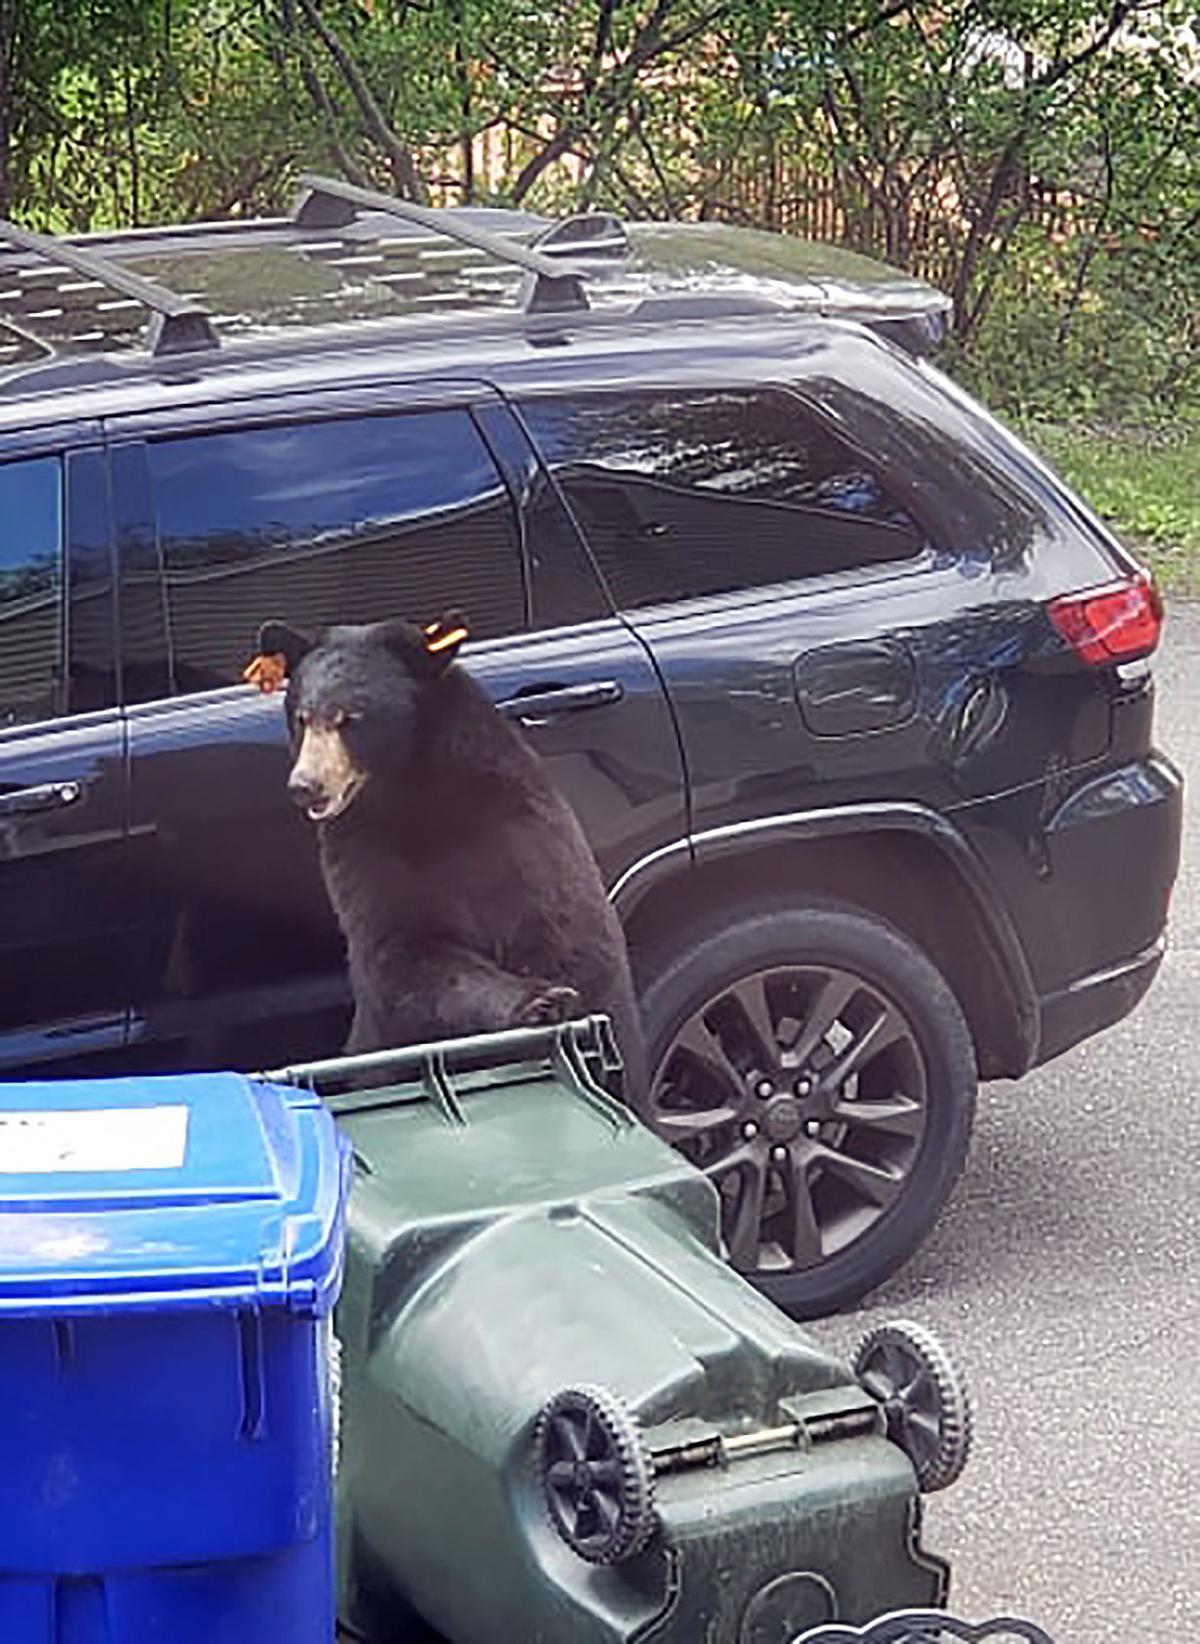 Thomaston: Black Bear Sightings on the Rise